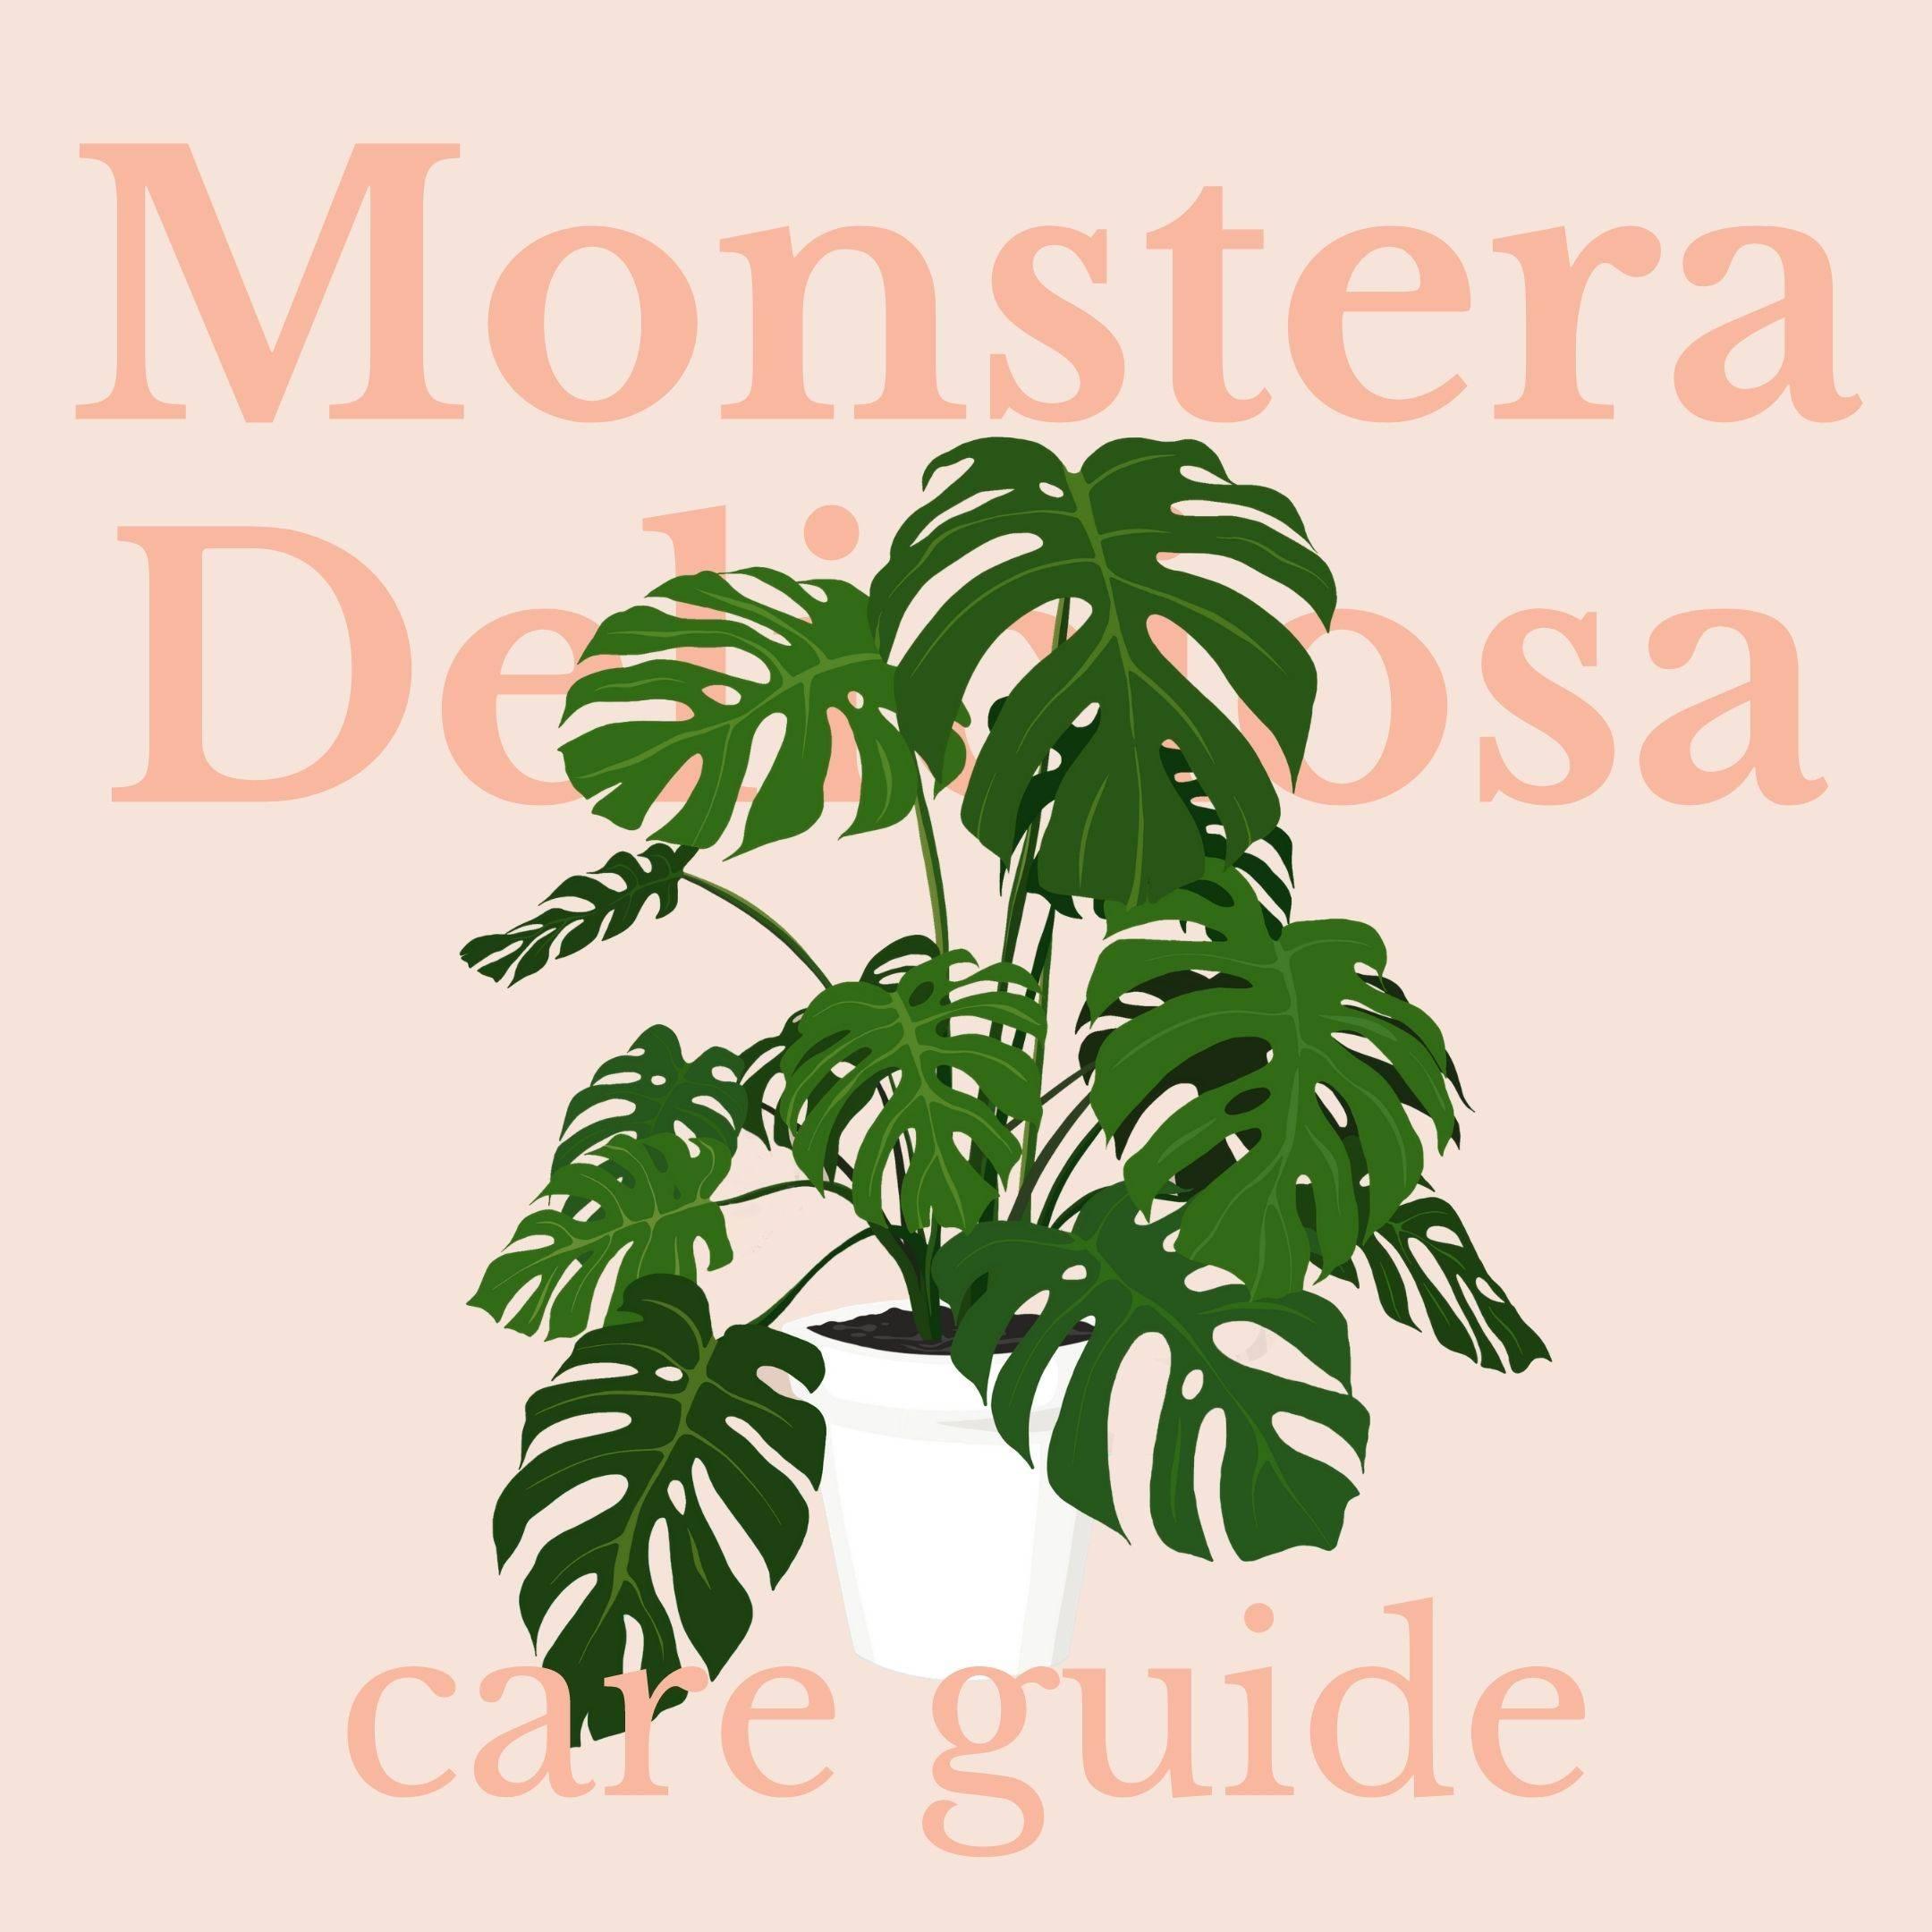 Drawing of monstera deliciosa